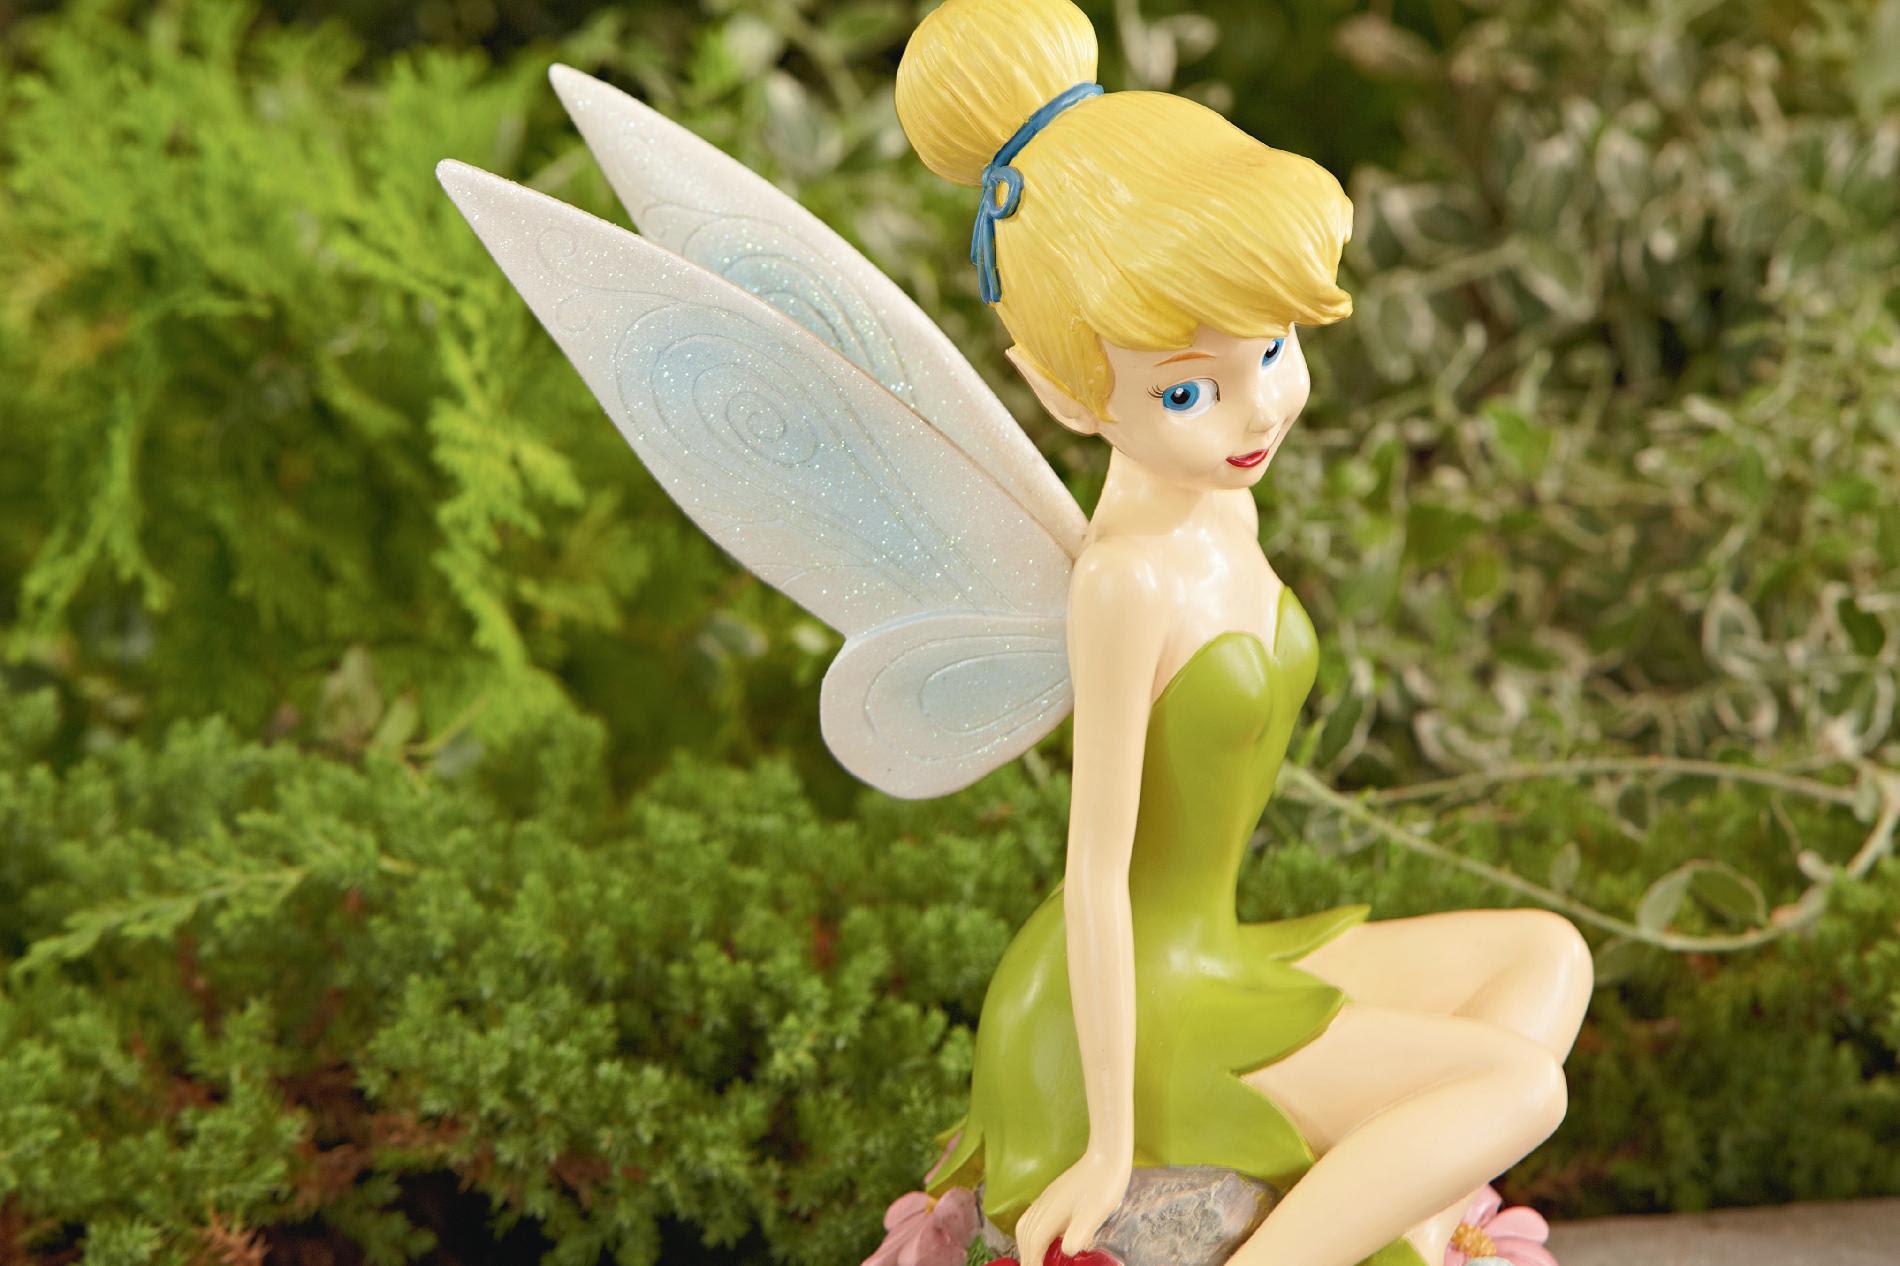 Disney Tinkerbell Statue - Outdoor Living - Outdoor Decor ...